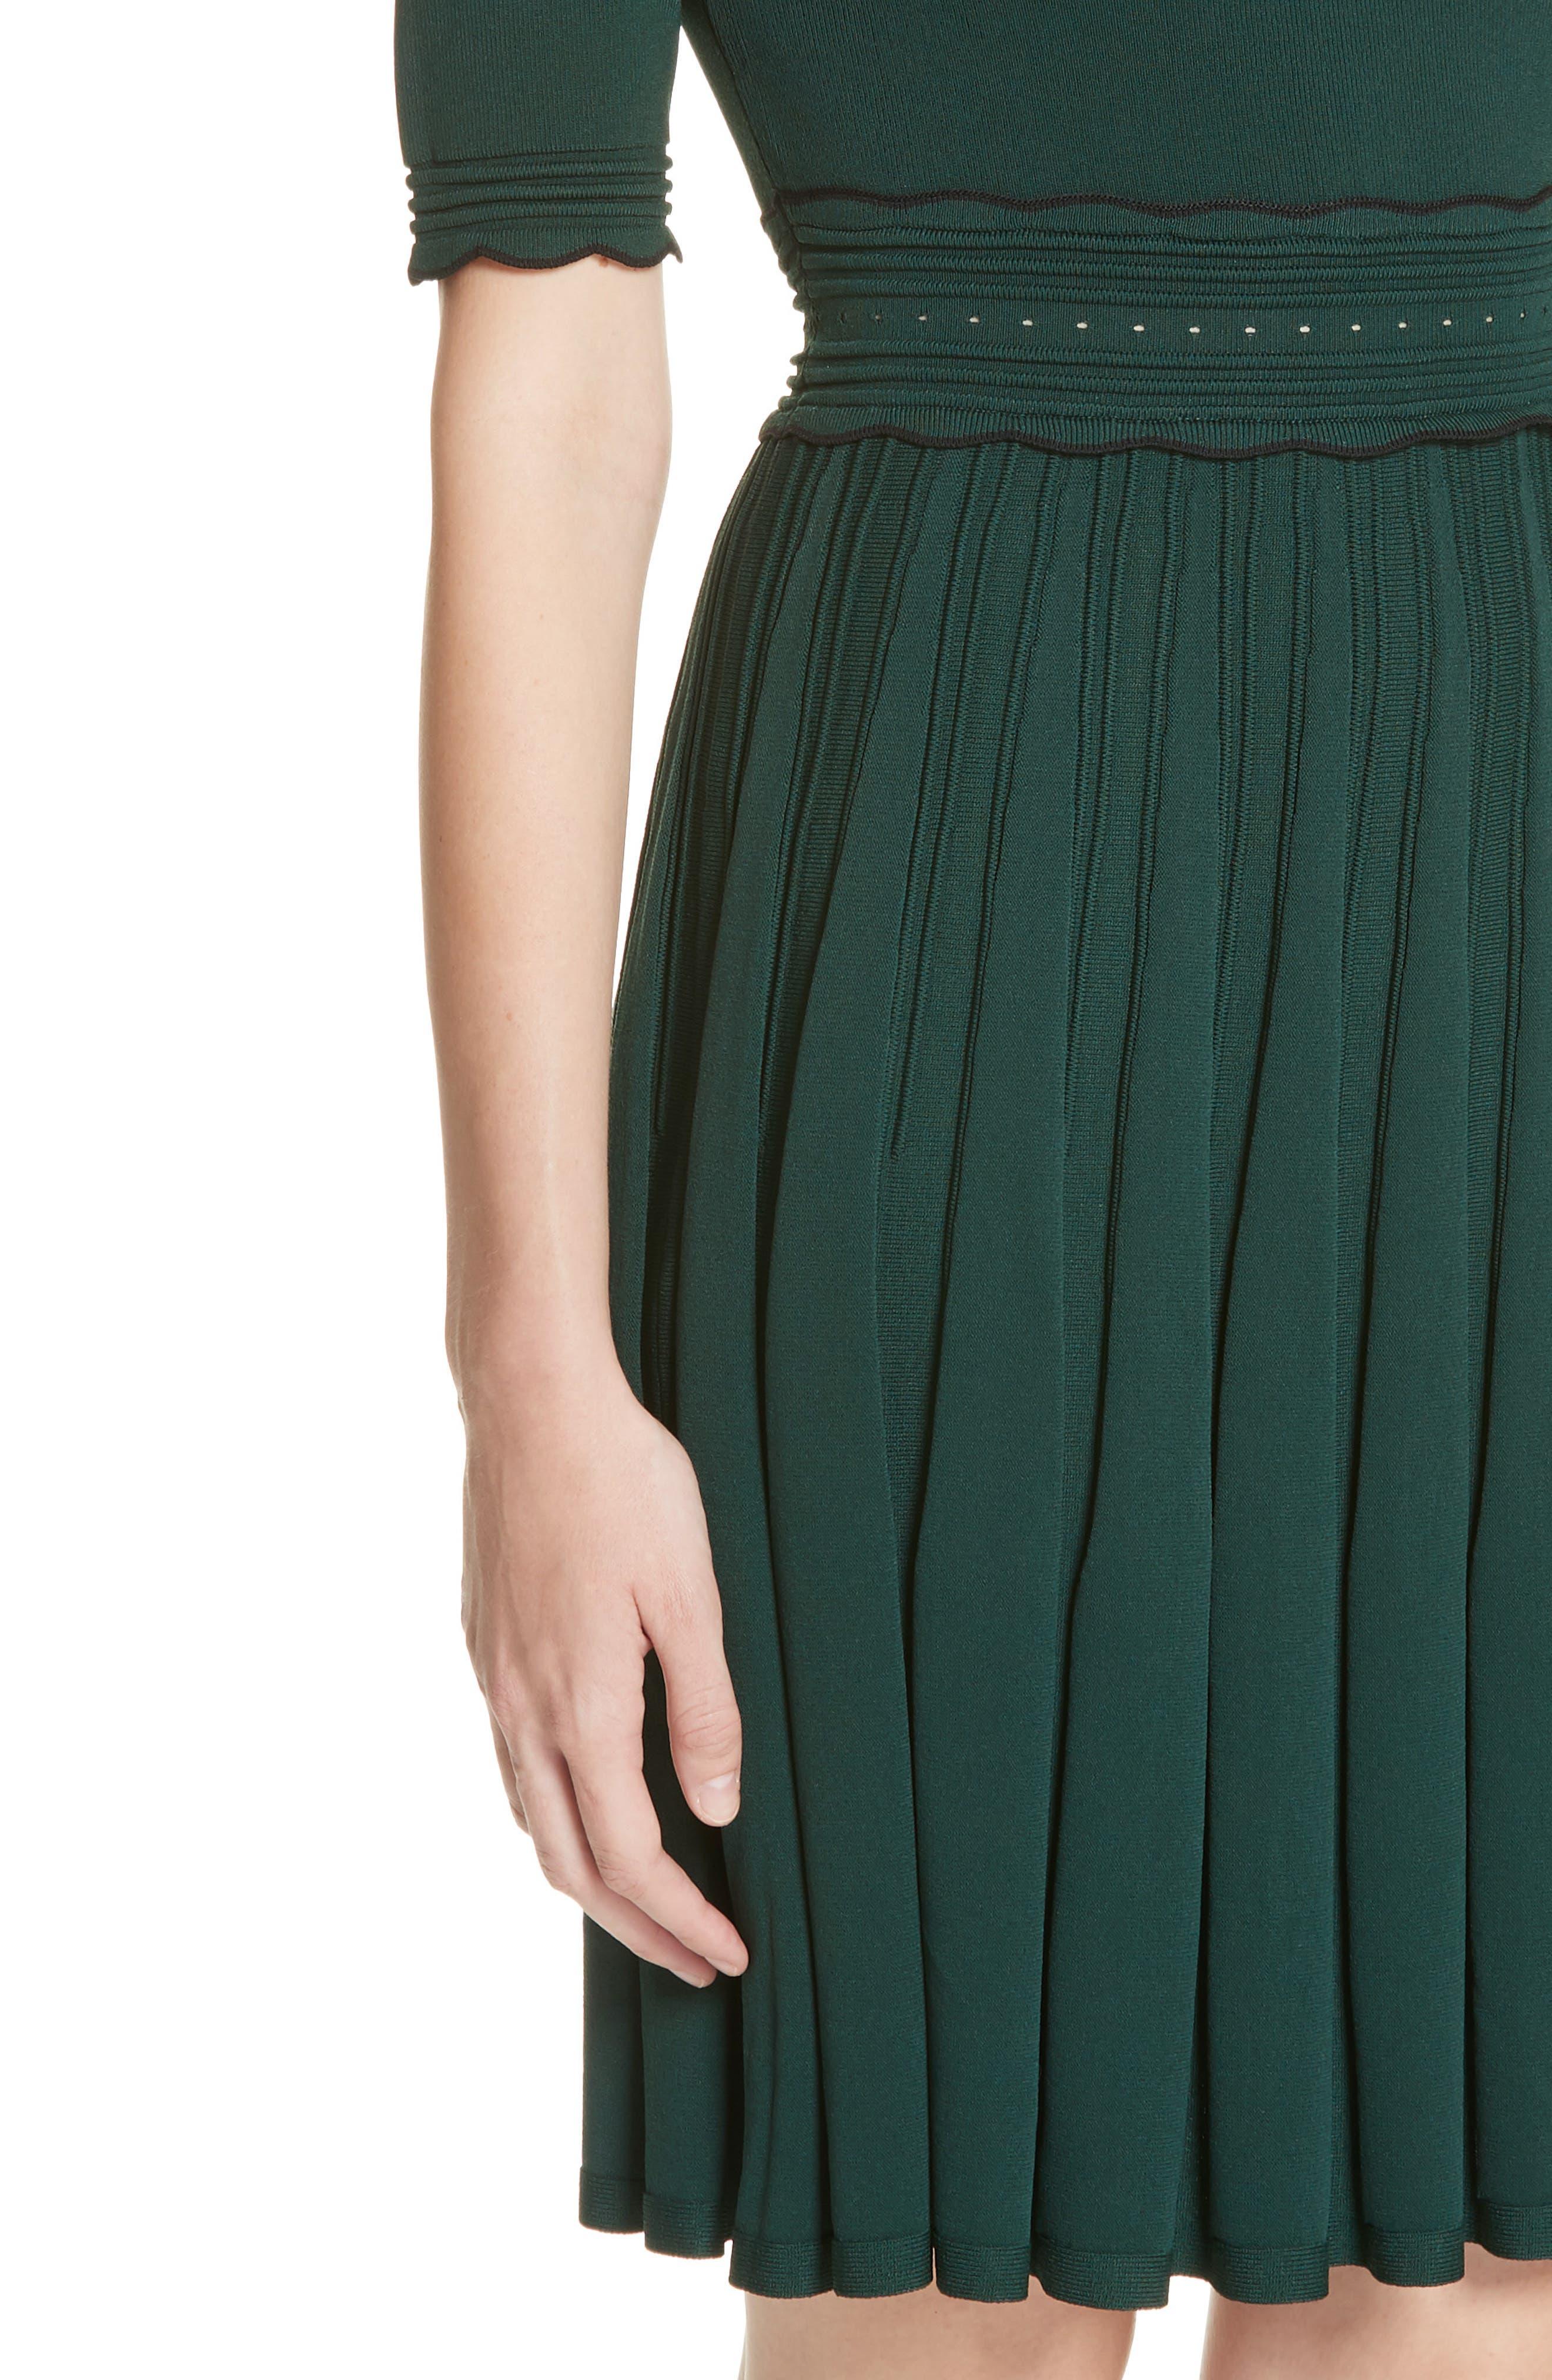 Dorlean Knit Dress,                             Alternate thumbnail 4, color,                             DARK GREEN